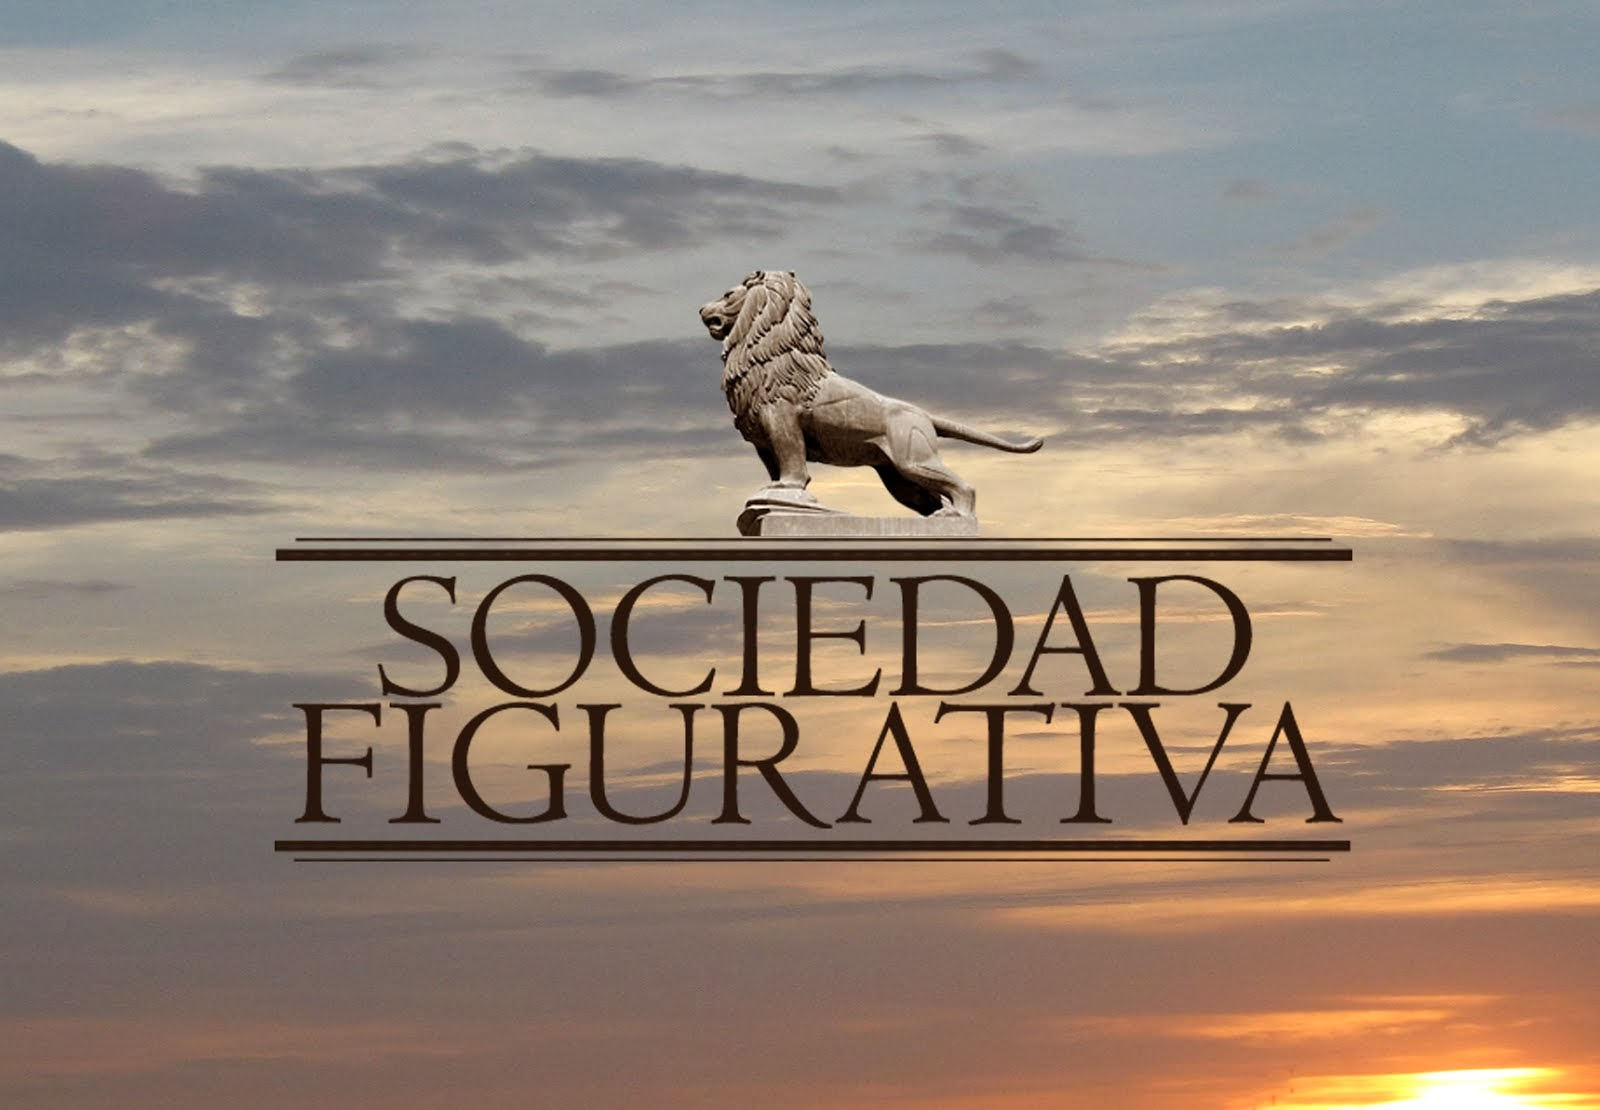 SOCIEDAD FIGURATIVA